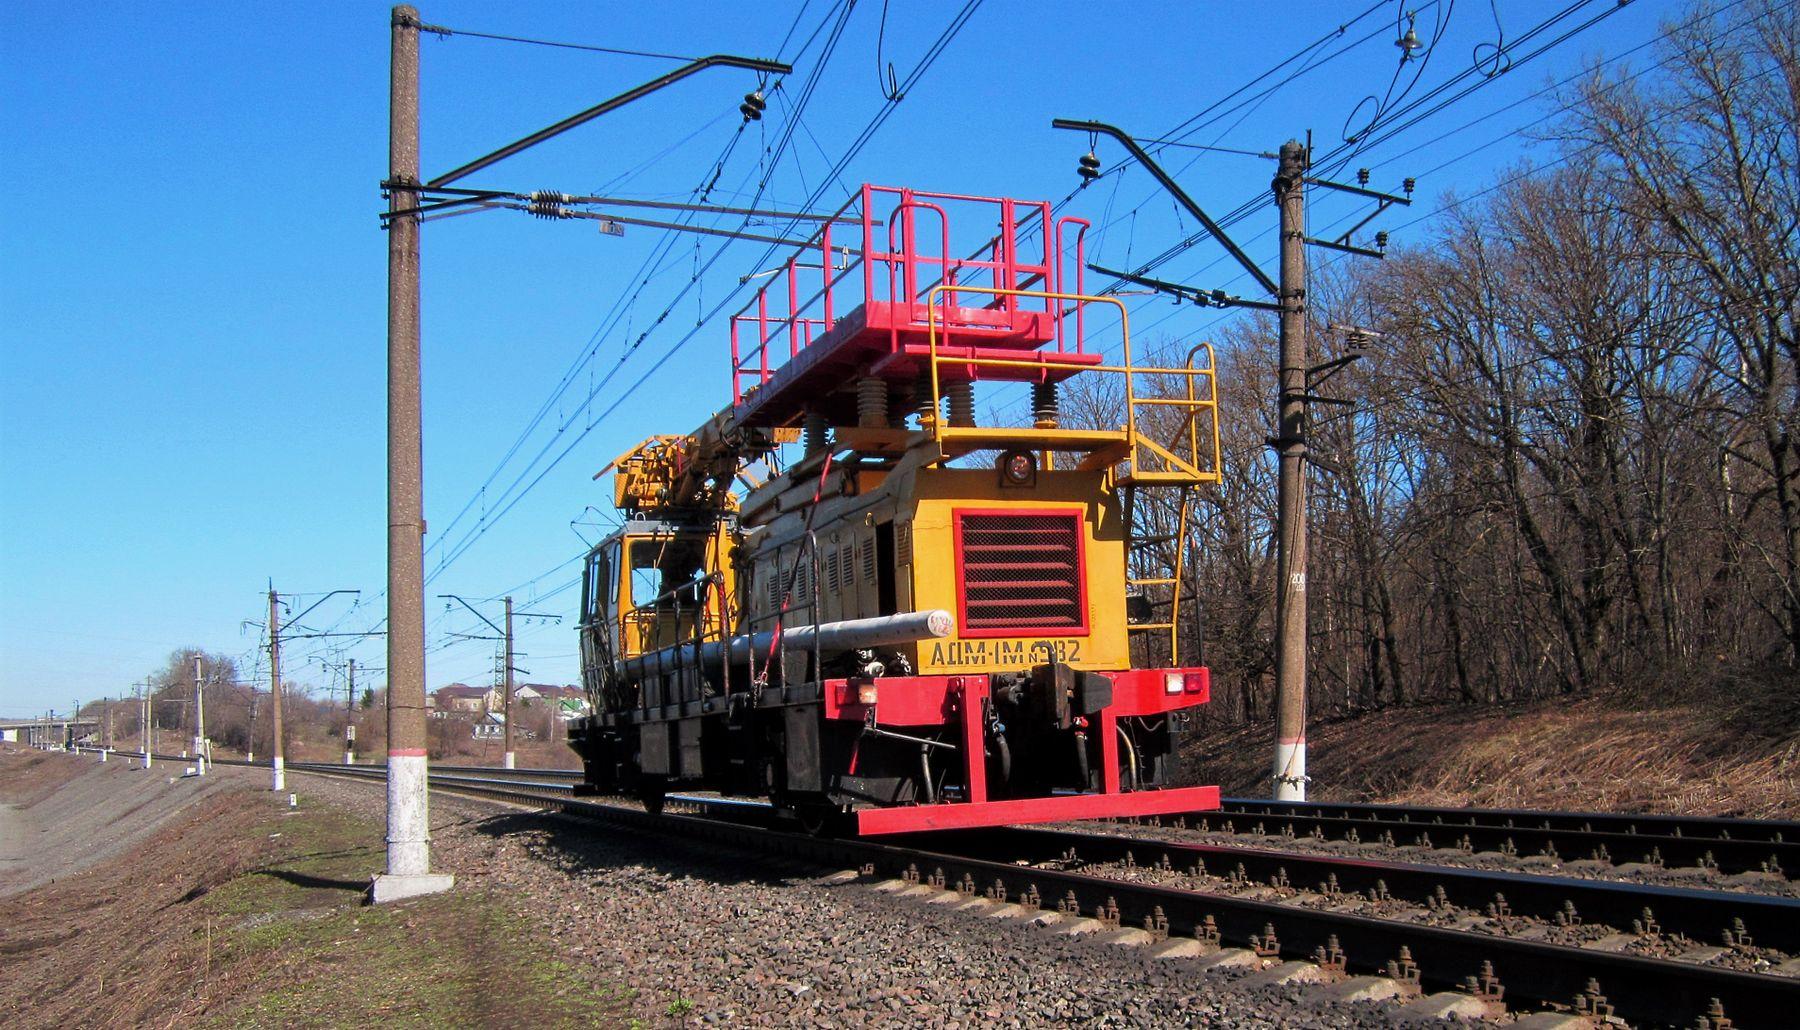 АДМ-1М - 982 АДМ-1М мотриса весна железная дорога